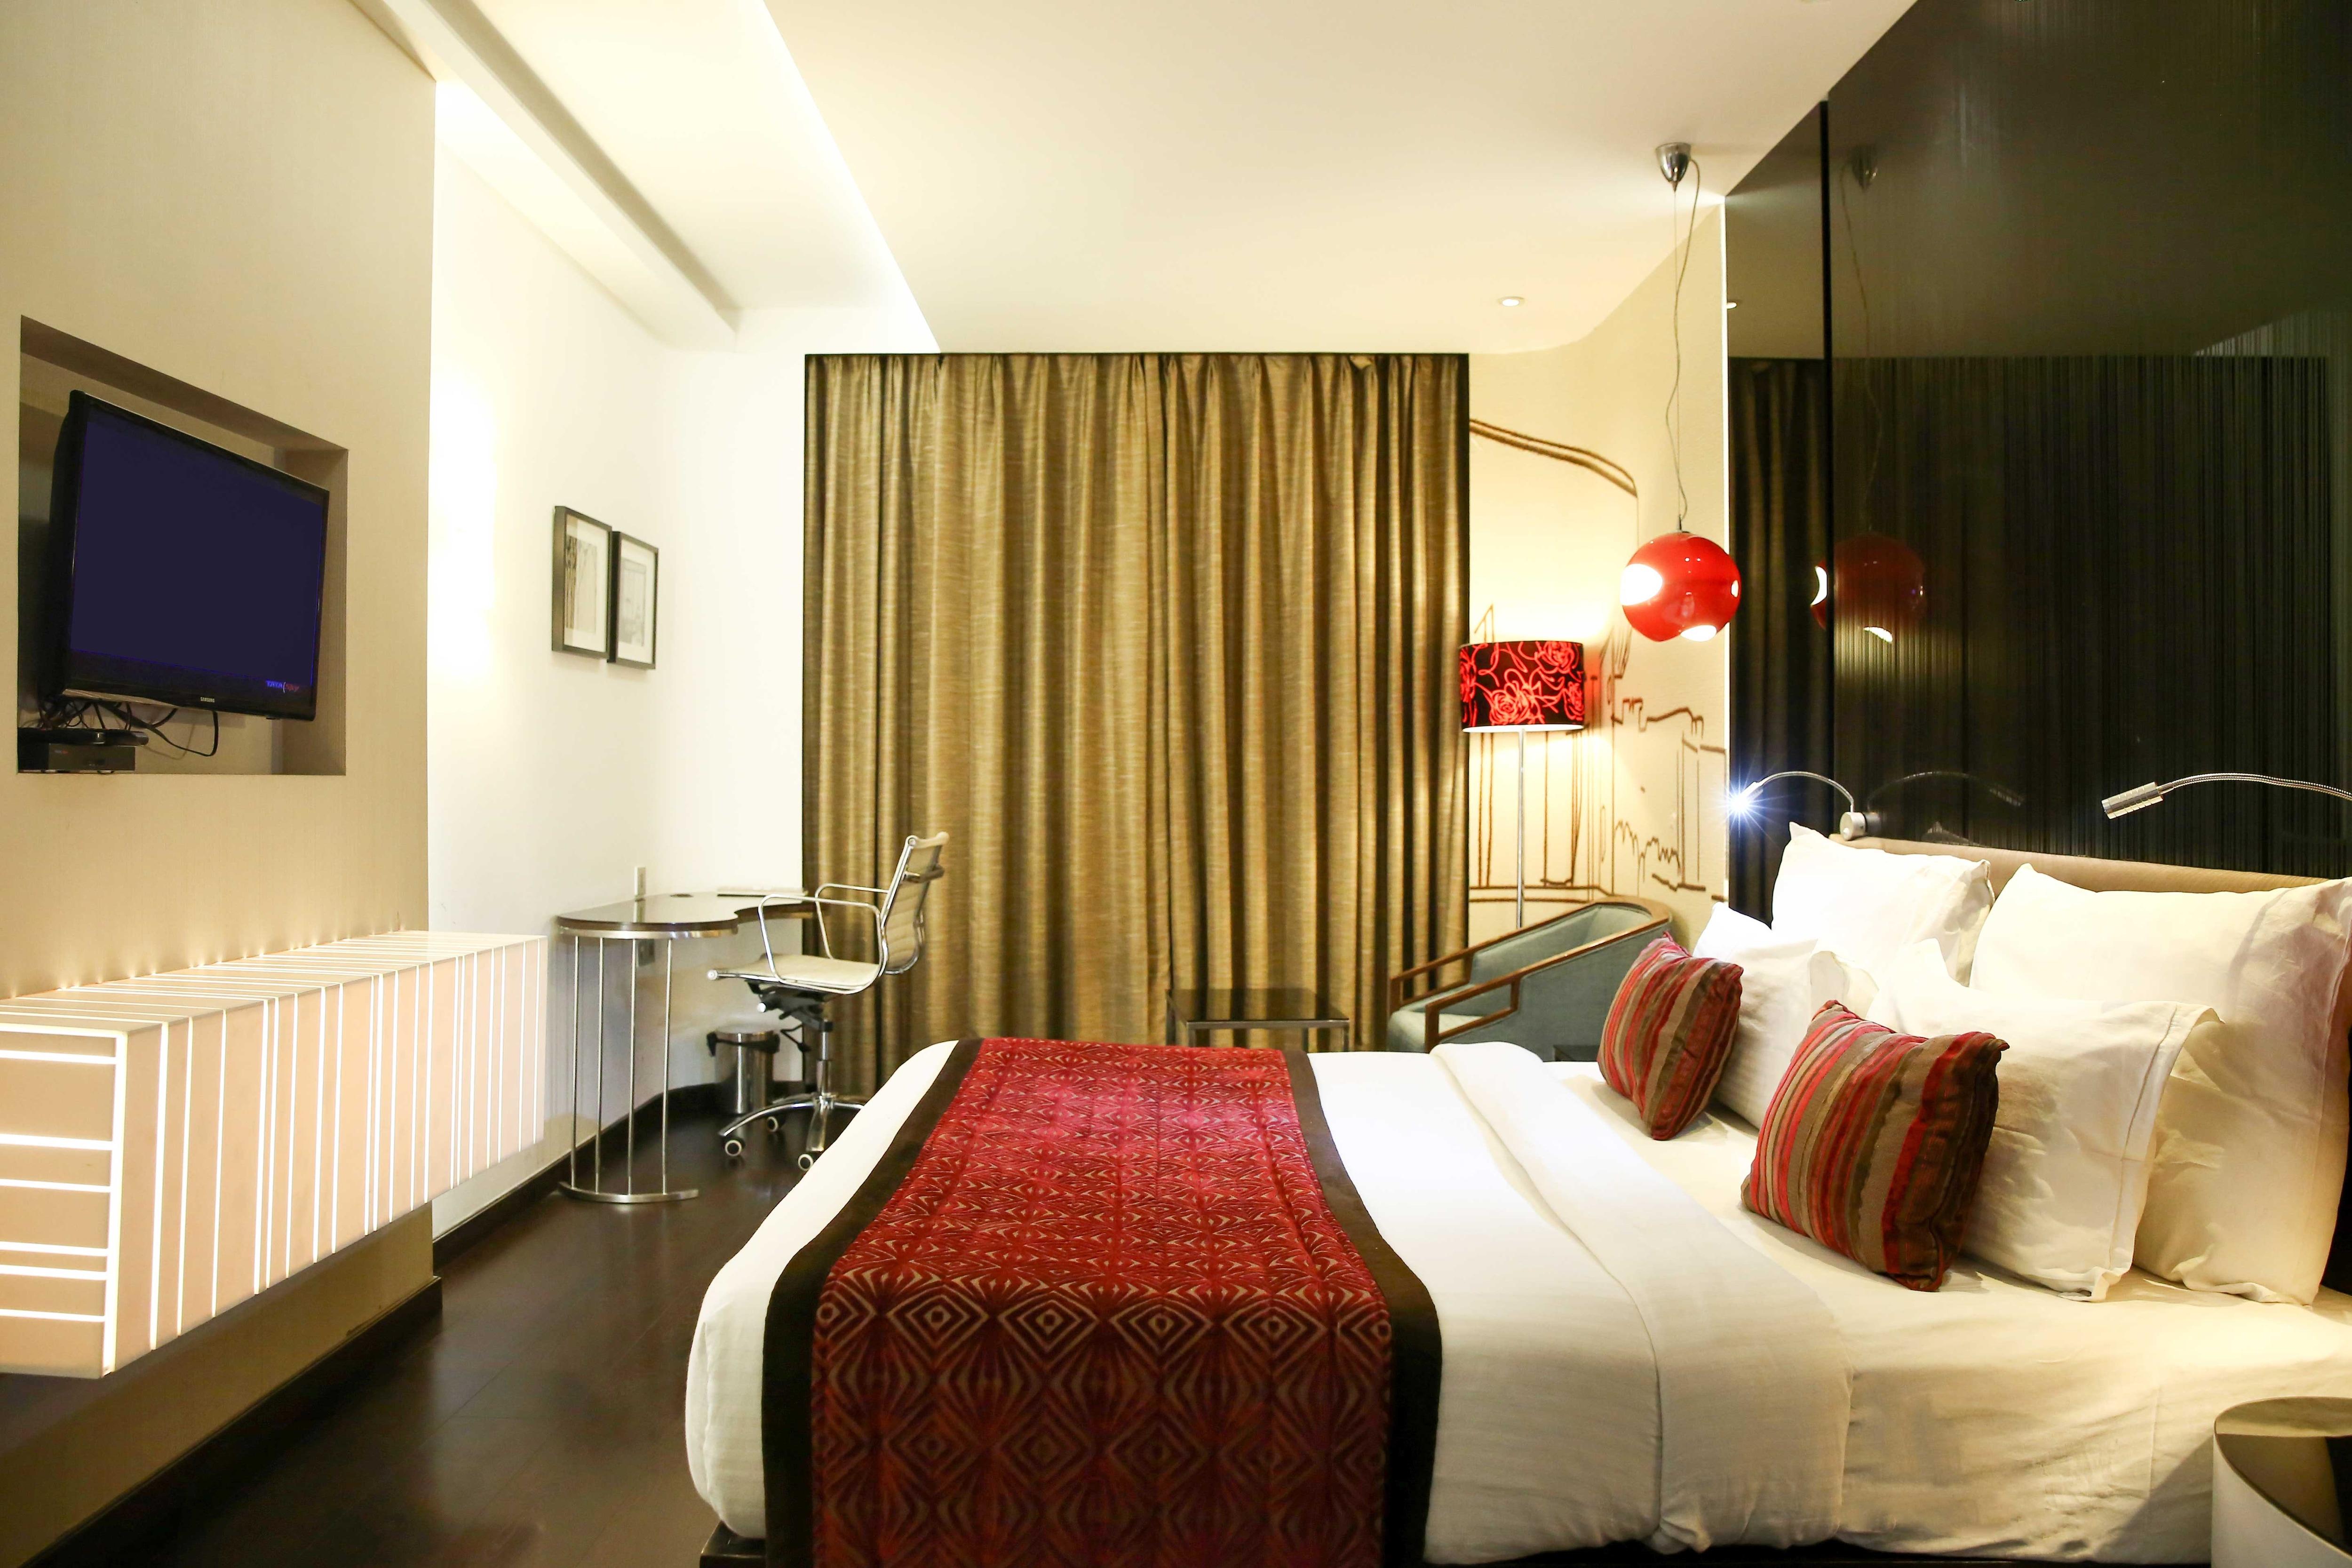 OYO 4896 The Gaur Hotel in Chandigarh